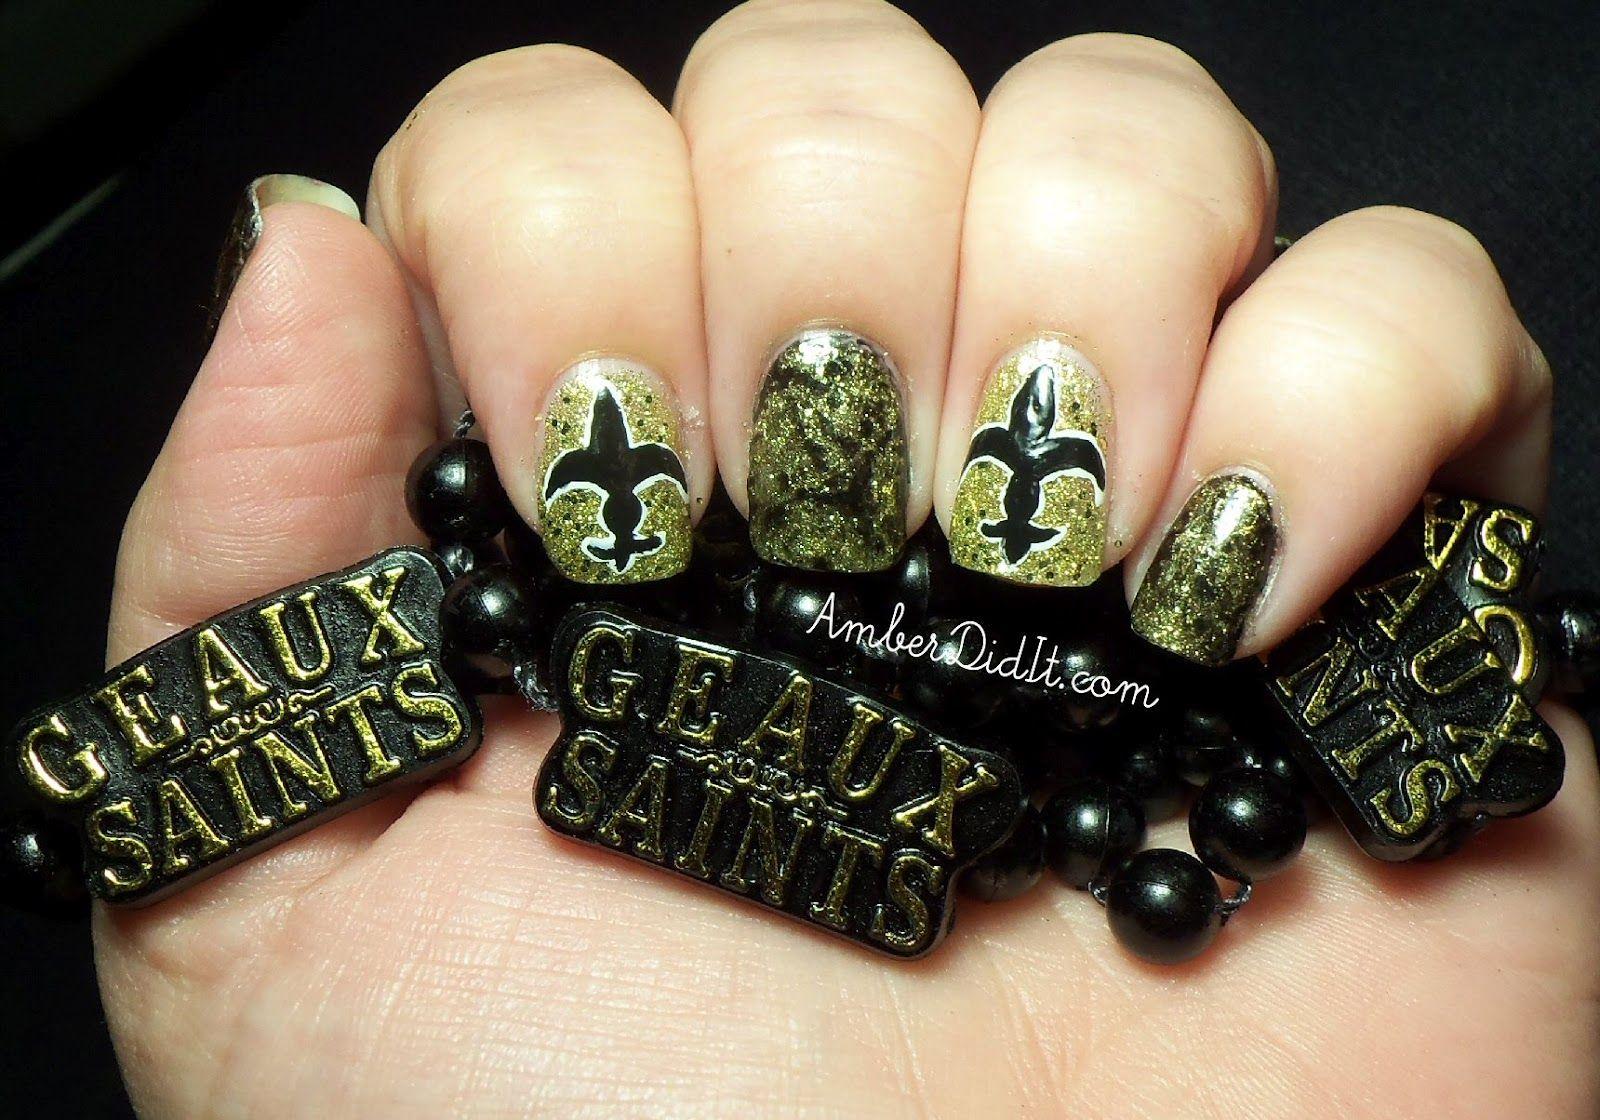 New Orleans Saints Nails | Nails by Amber | Pinterest | Saints nails ...